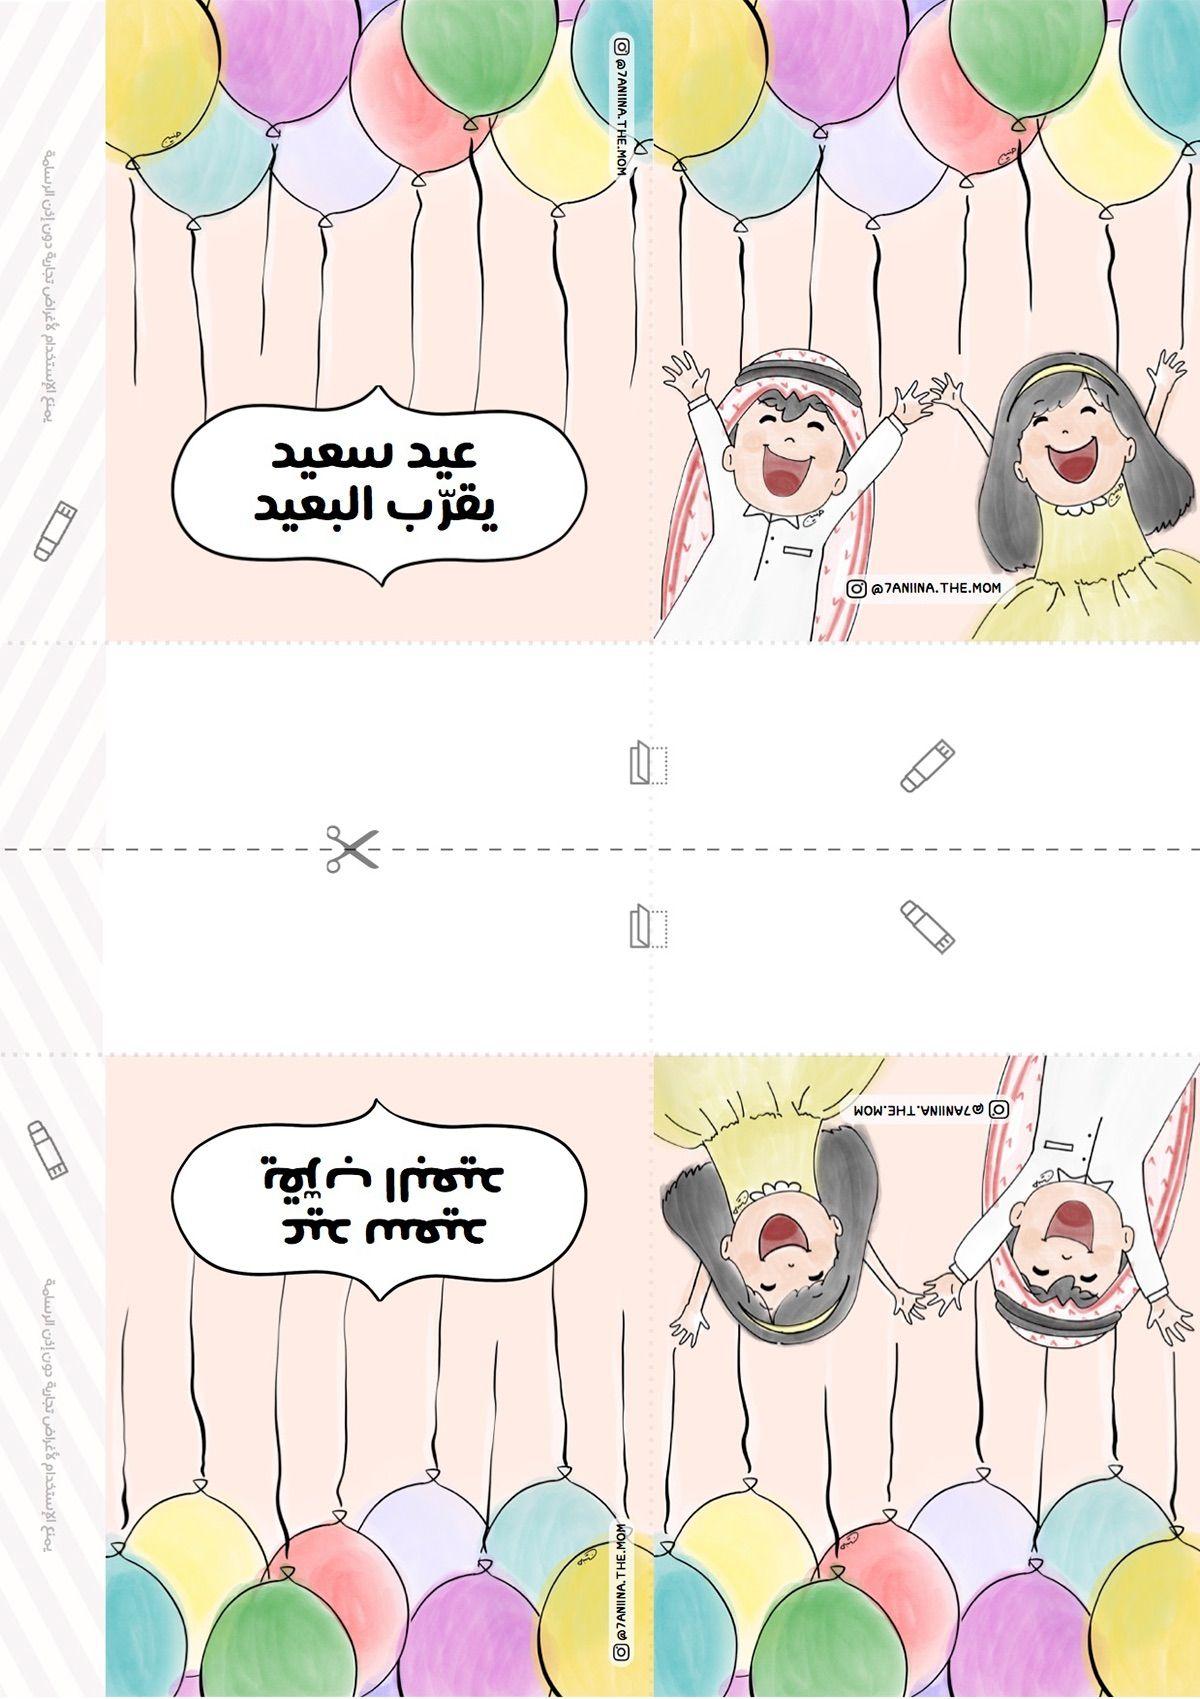 Https Www Behance Net 7aniina Eid Crafts Eid Cards Eid Mubarak Stickers